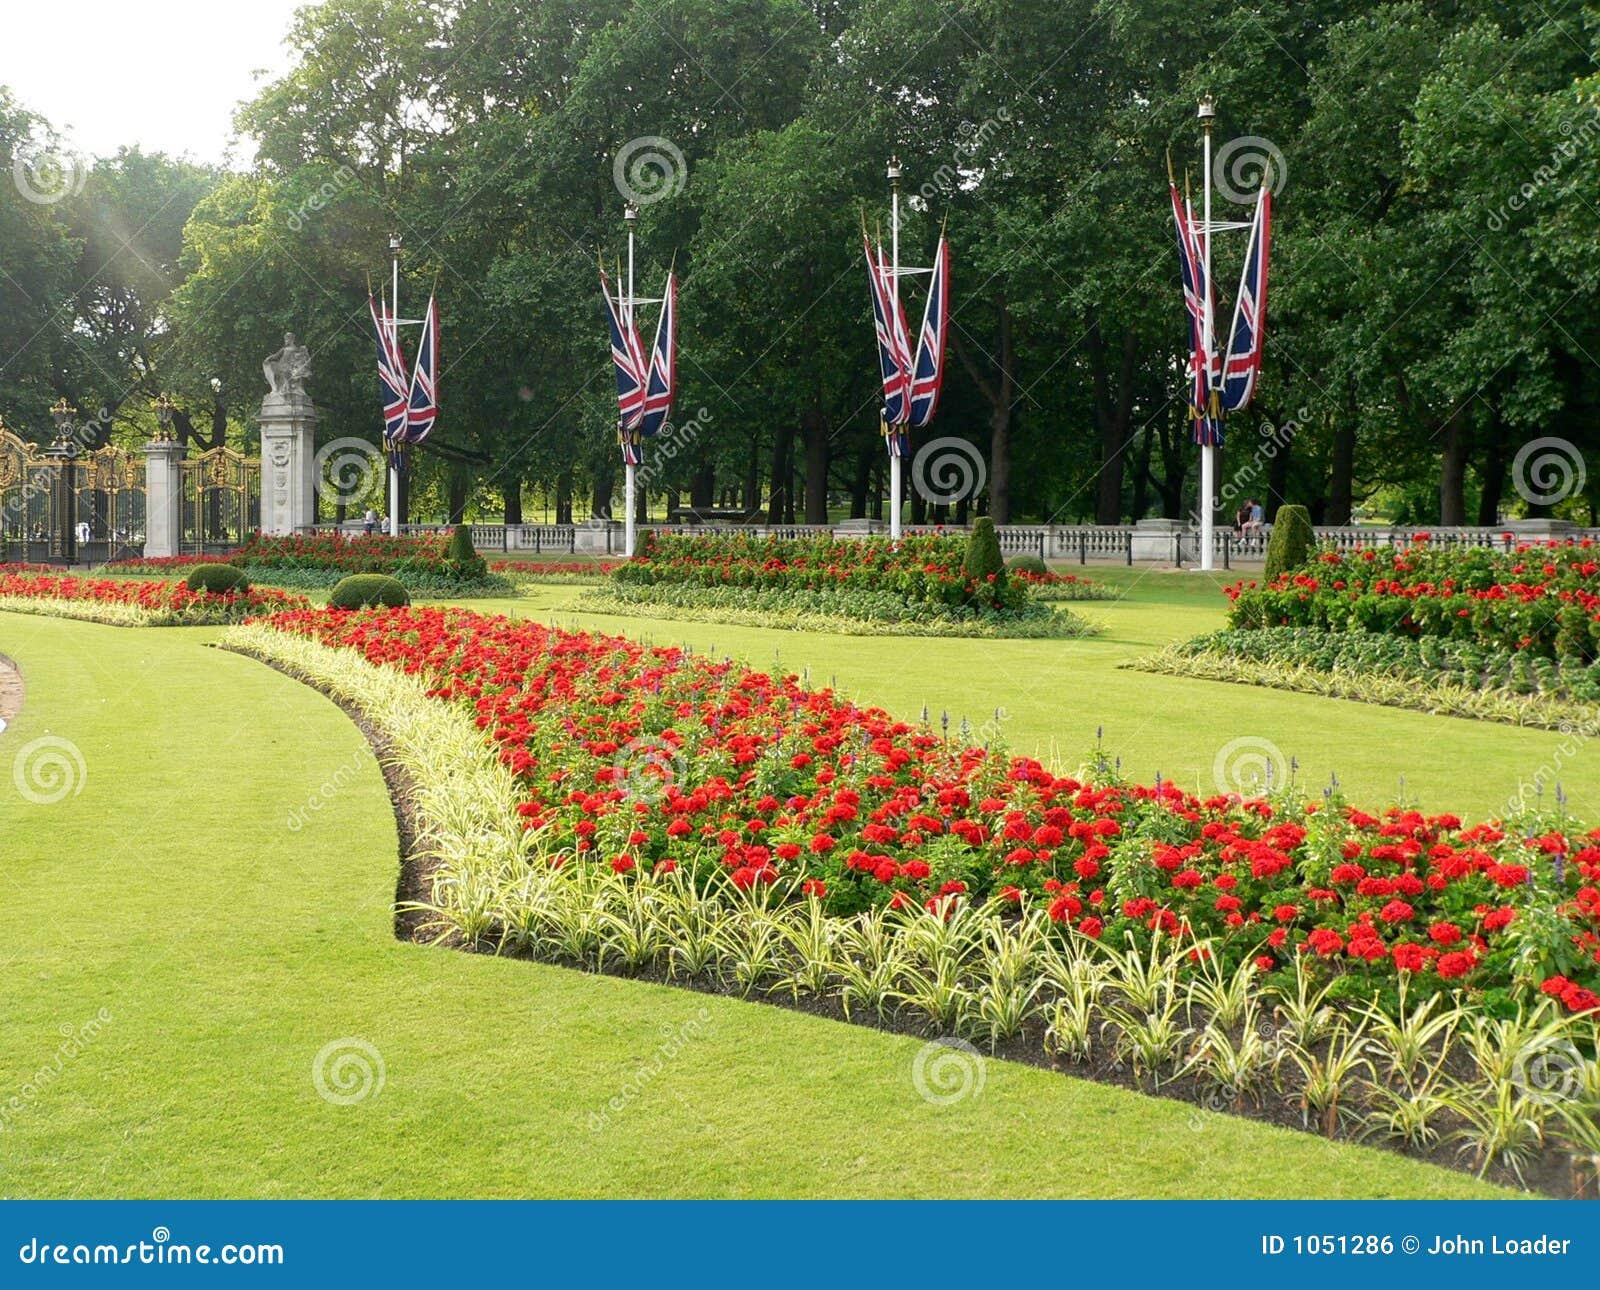 Jardins De Londres Imagem de Stock Royalty Free  Imagem 1051286